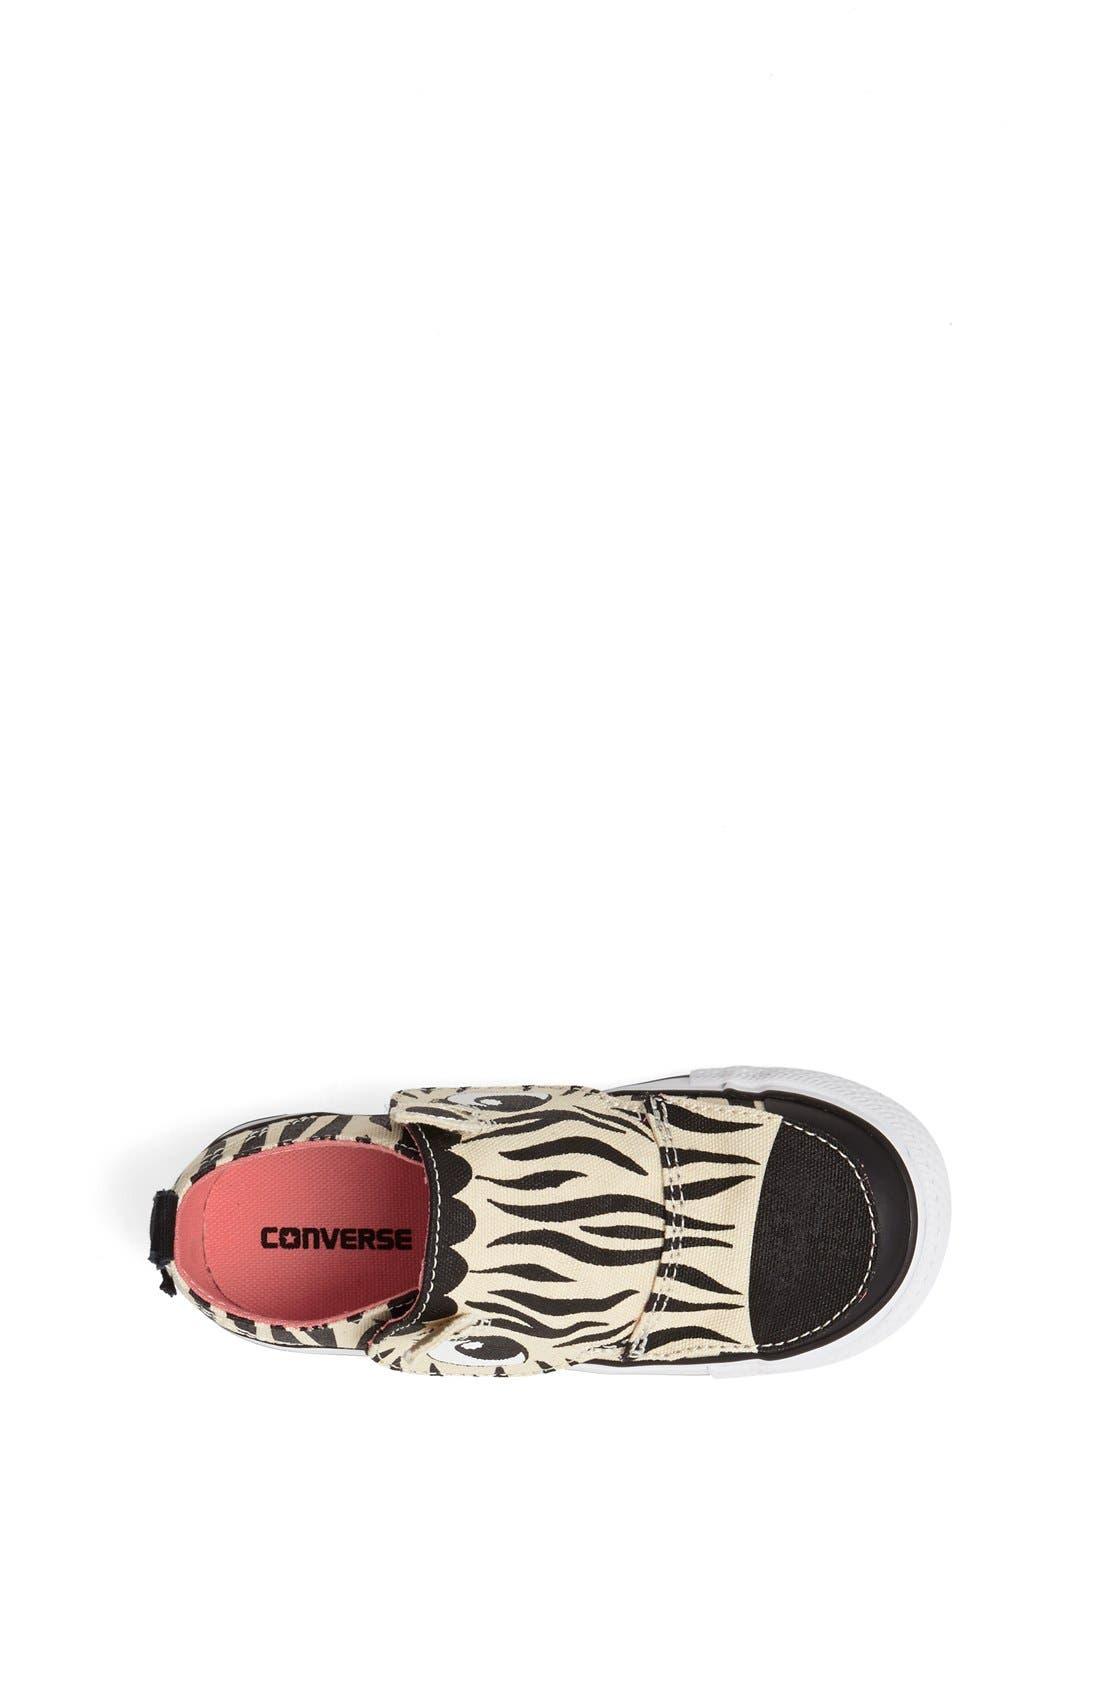 Alternate Image 3  - Converse 'No Problem' Zebra Face Sneaker (Baby, Walker & Toddler)